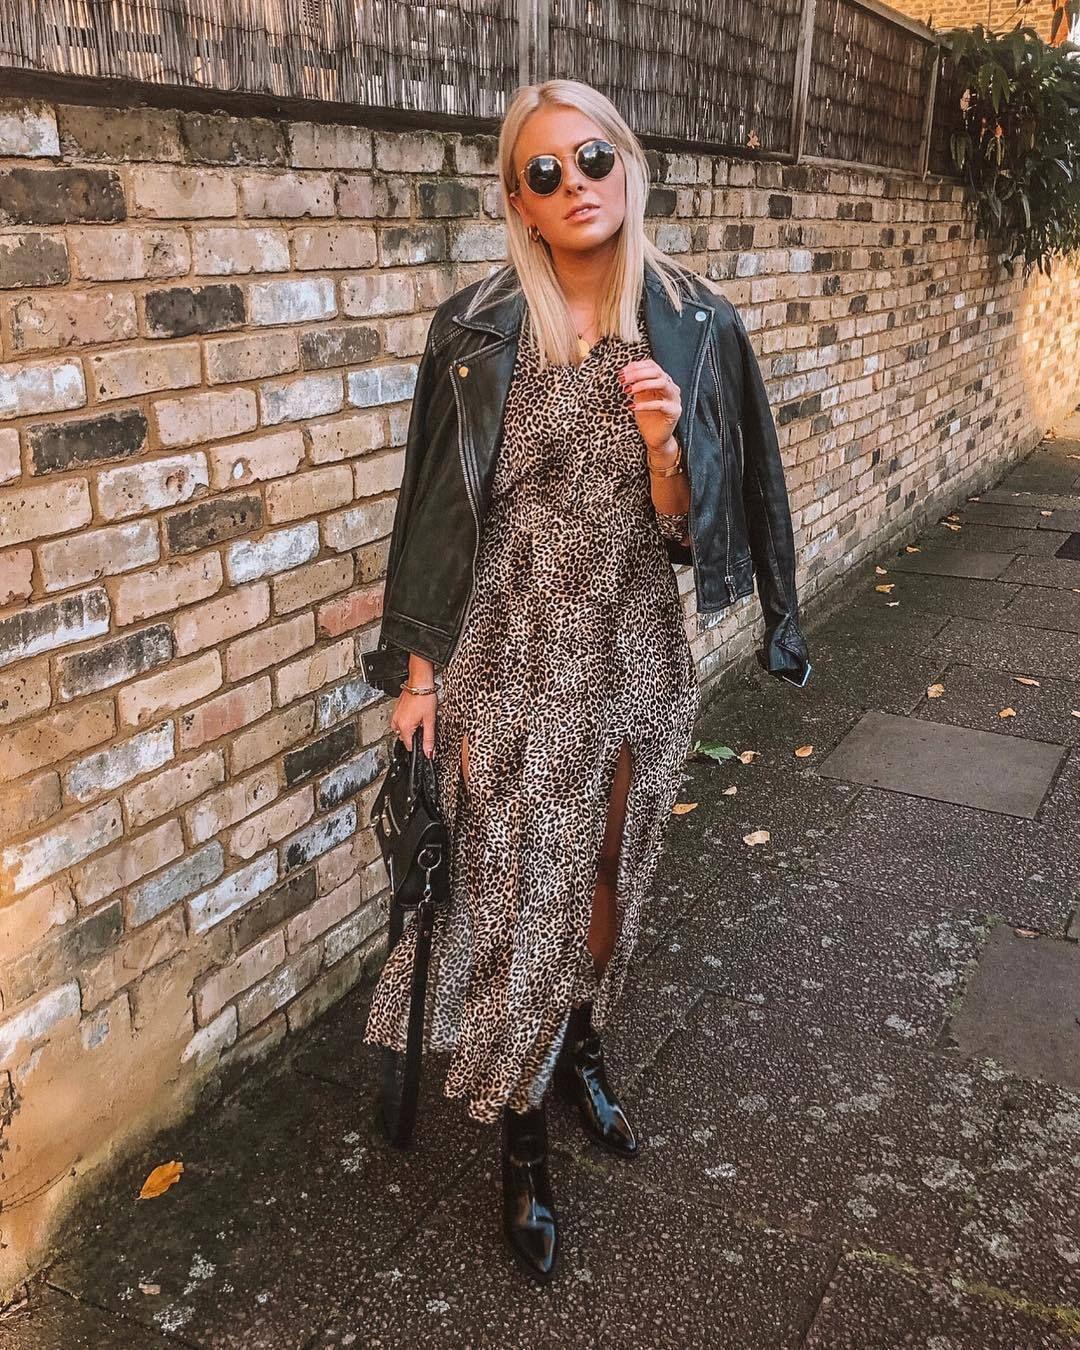 f8b2b119c80 Get the dress for 49£ at Topshop UK - Wheretoget | Clothes | Dresses ...